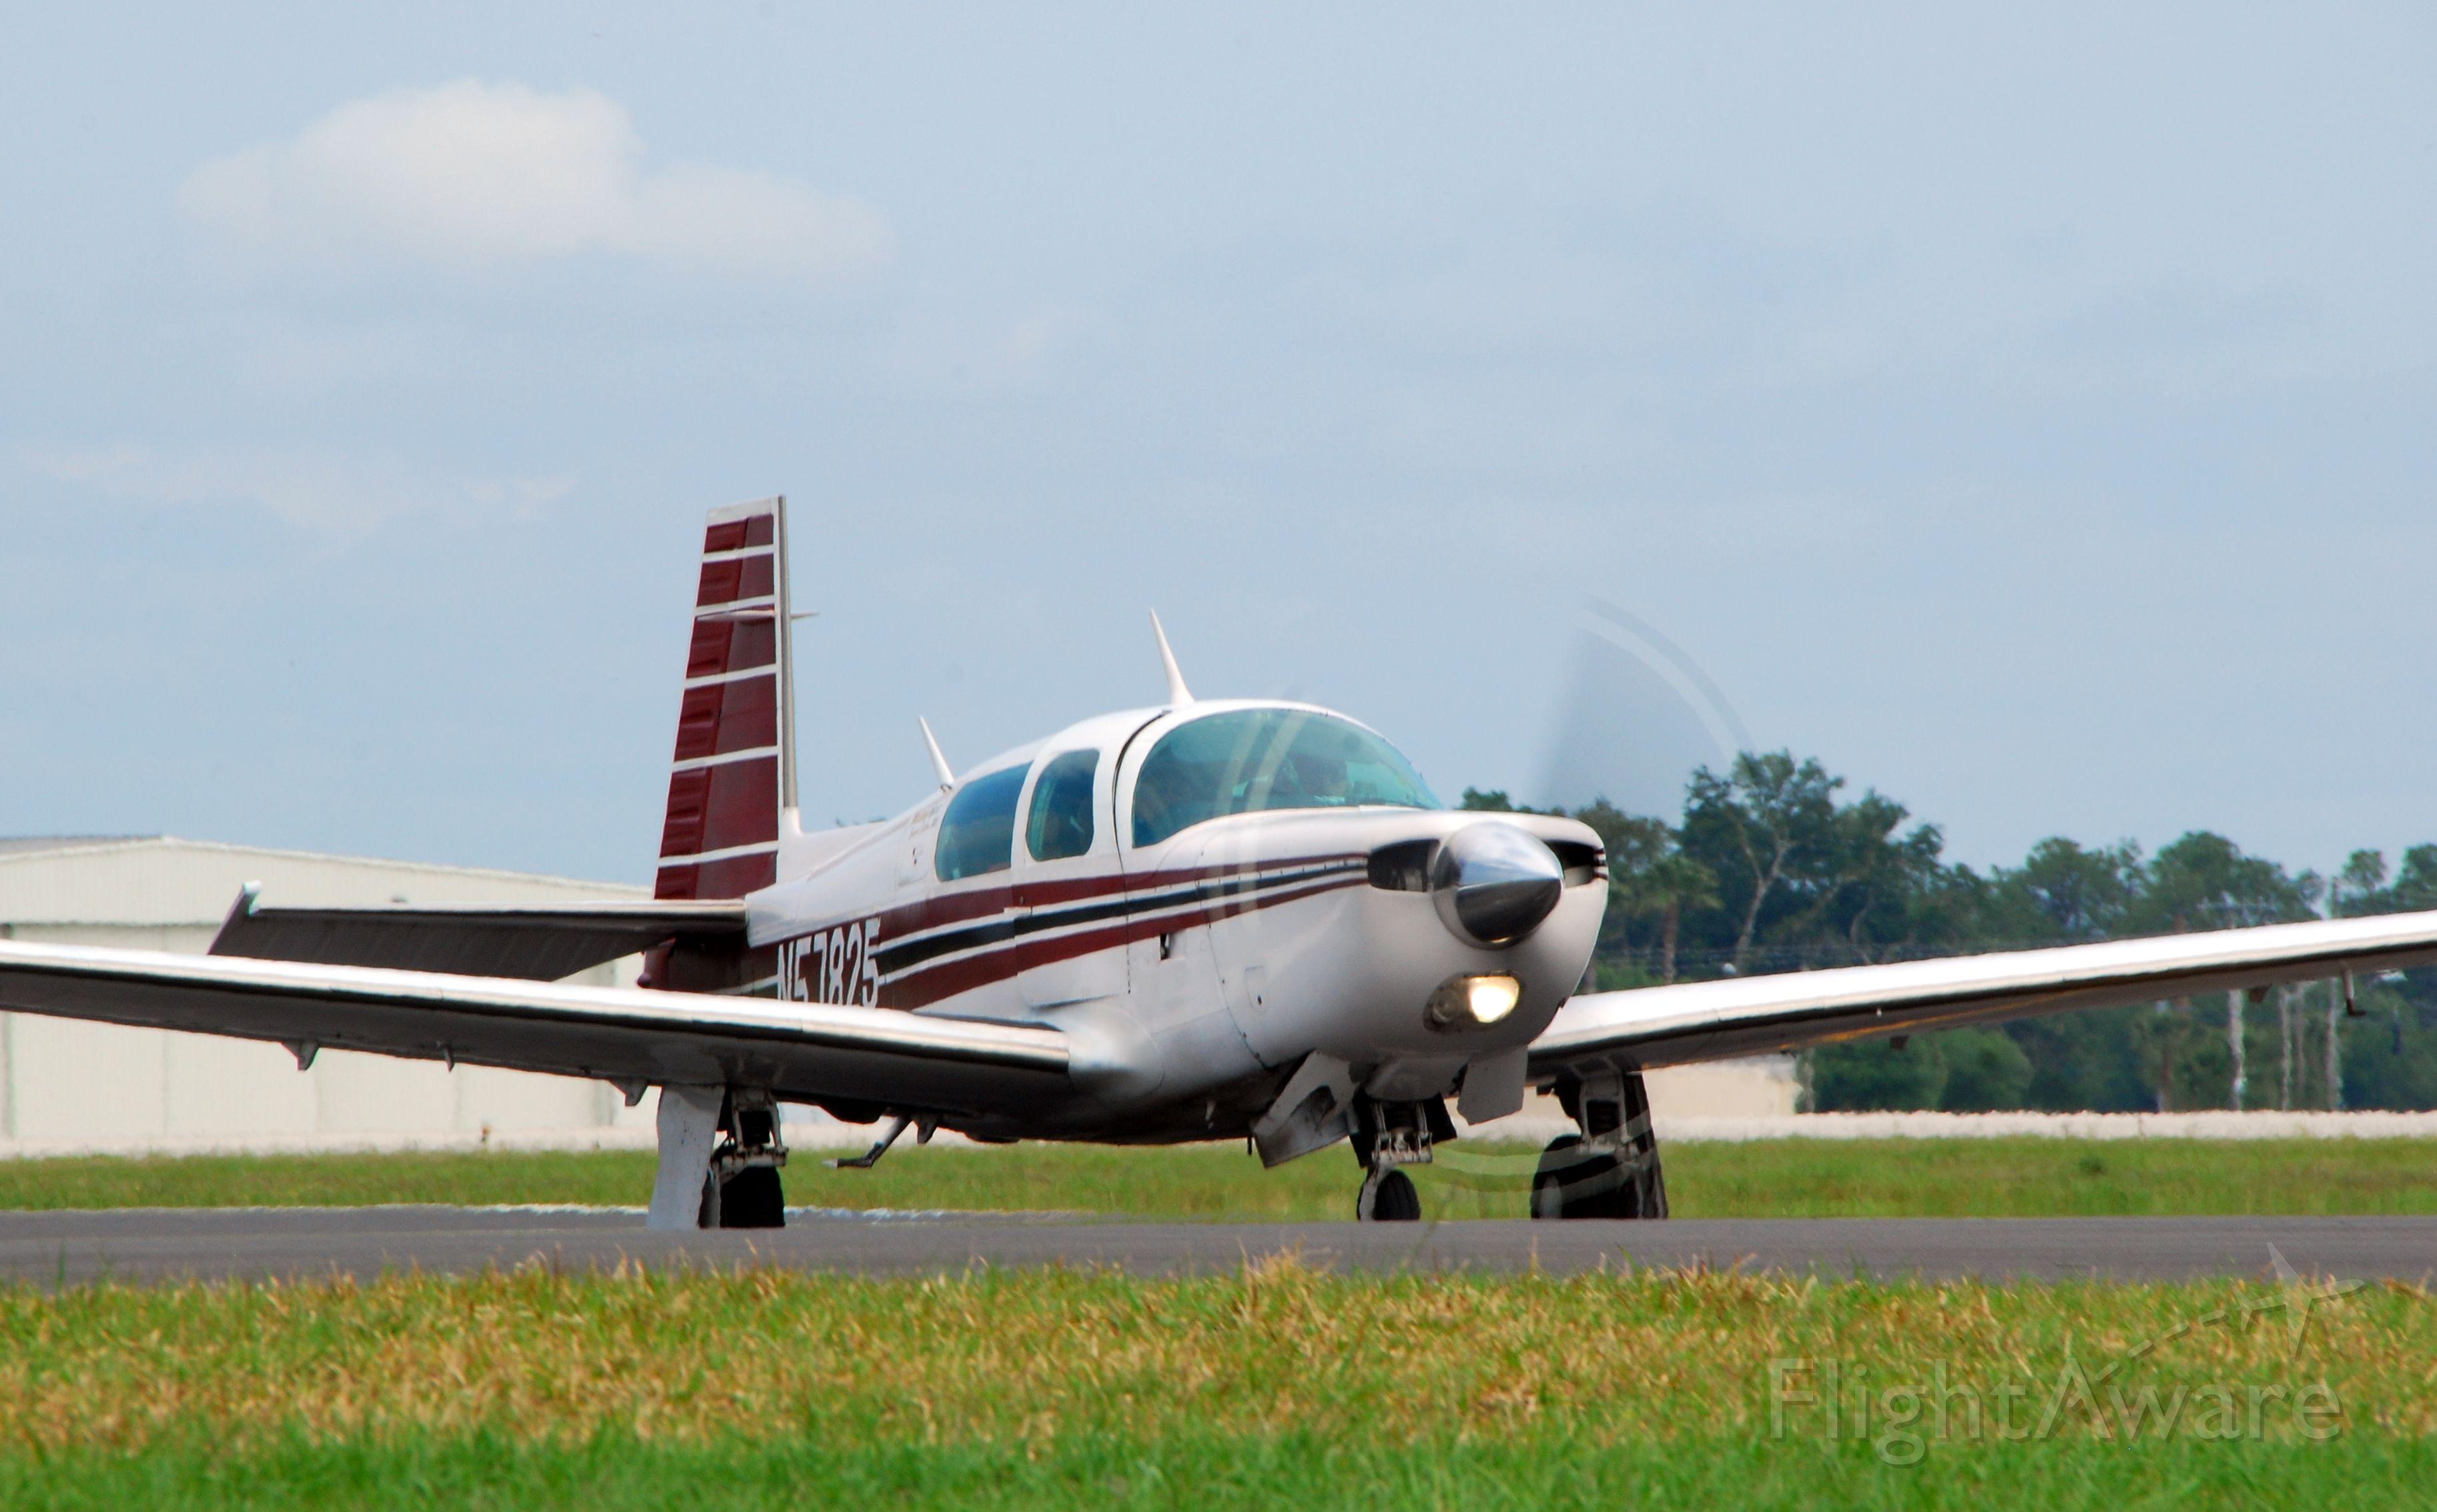 Mooney M-20 Turbo (N57825) - 2013 Sun n Fun Parade of Planes